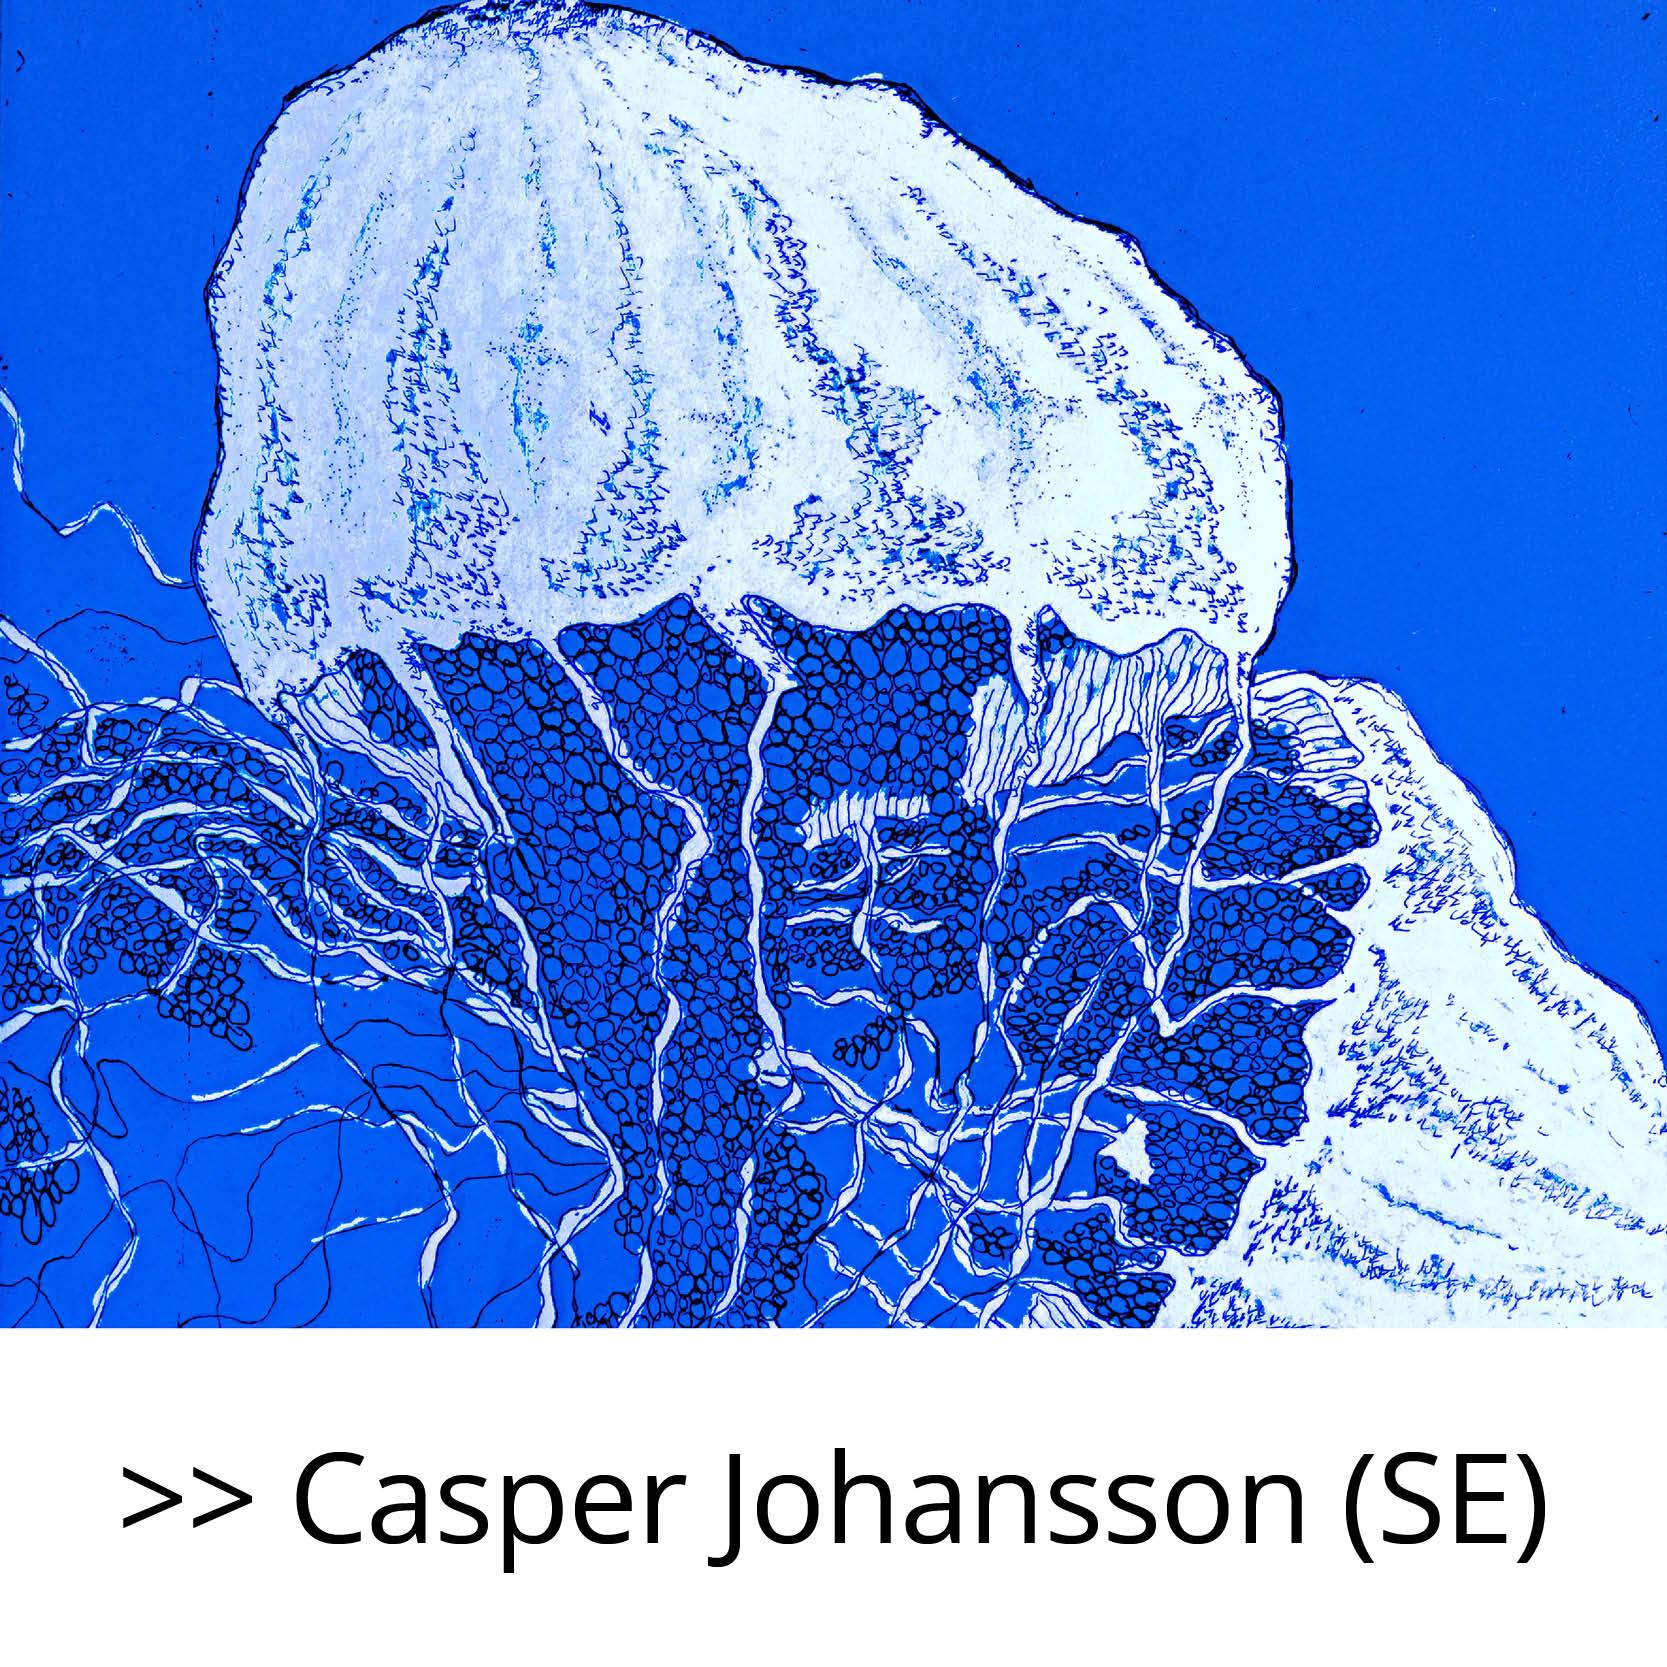 Casper_Johansson_(SE)